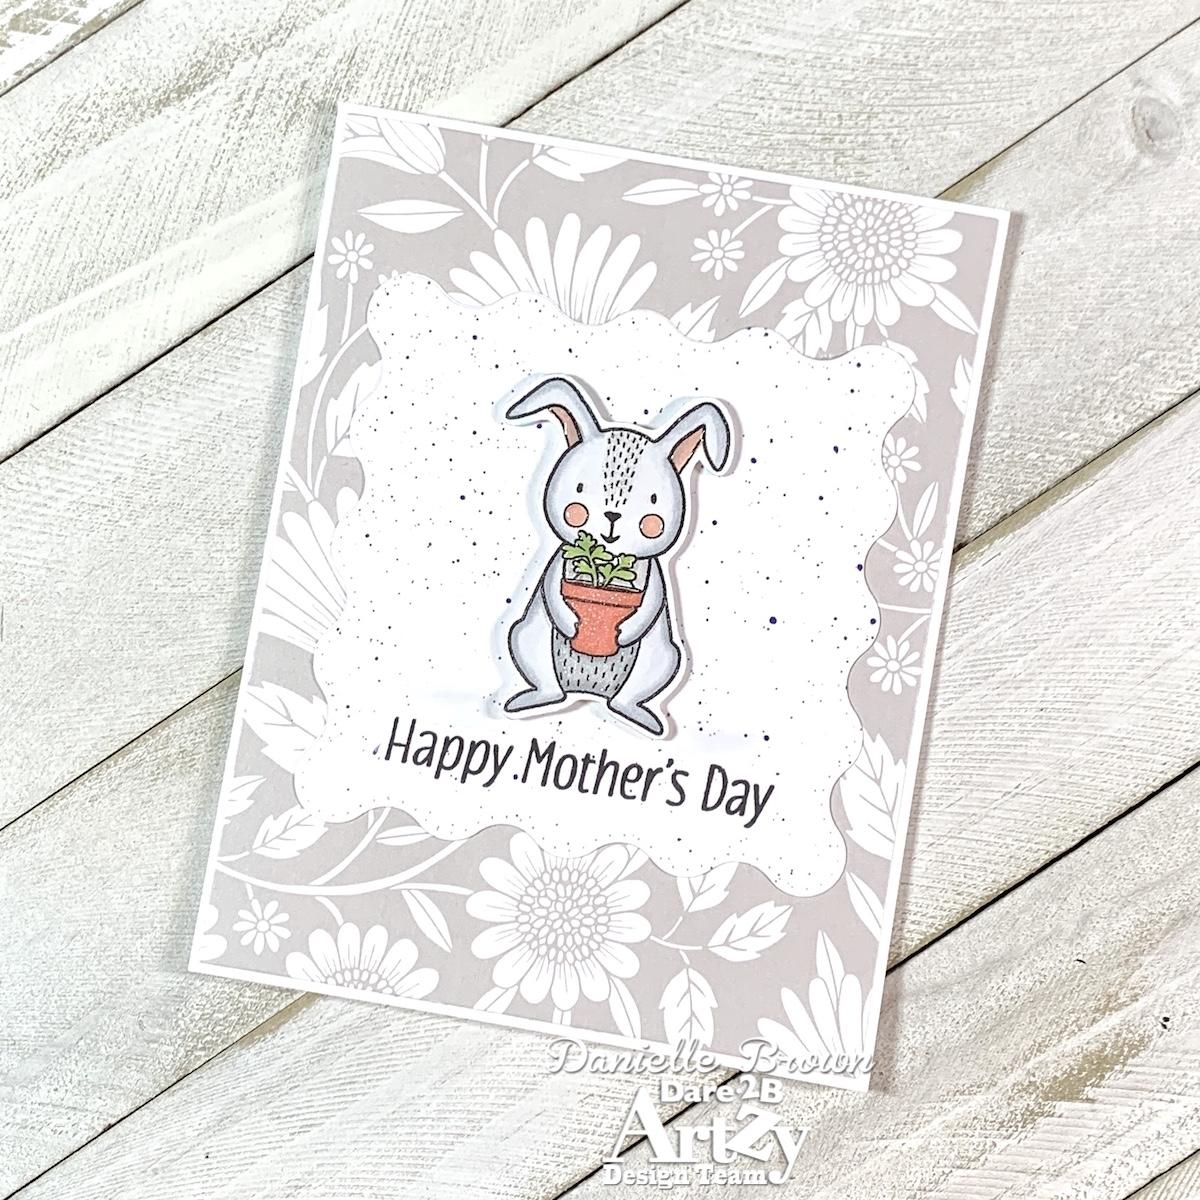 Honey Bunny Mother's Day, Dare 2B Artzy, Pattern Paper, Design Team